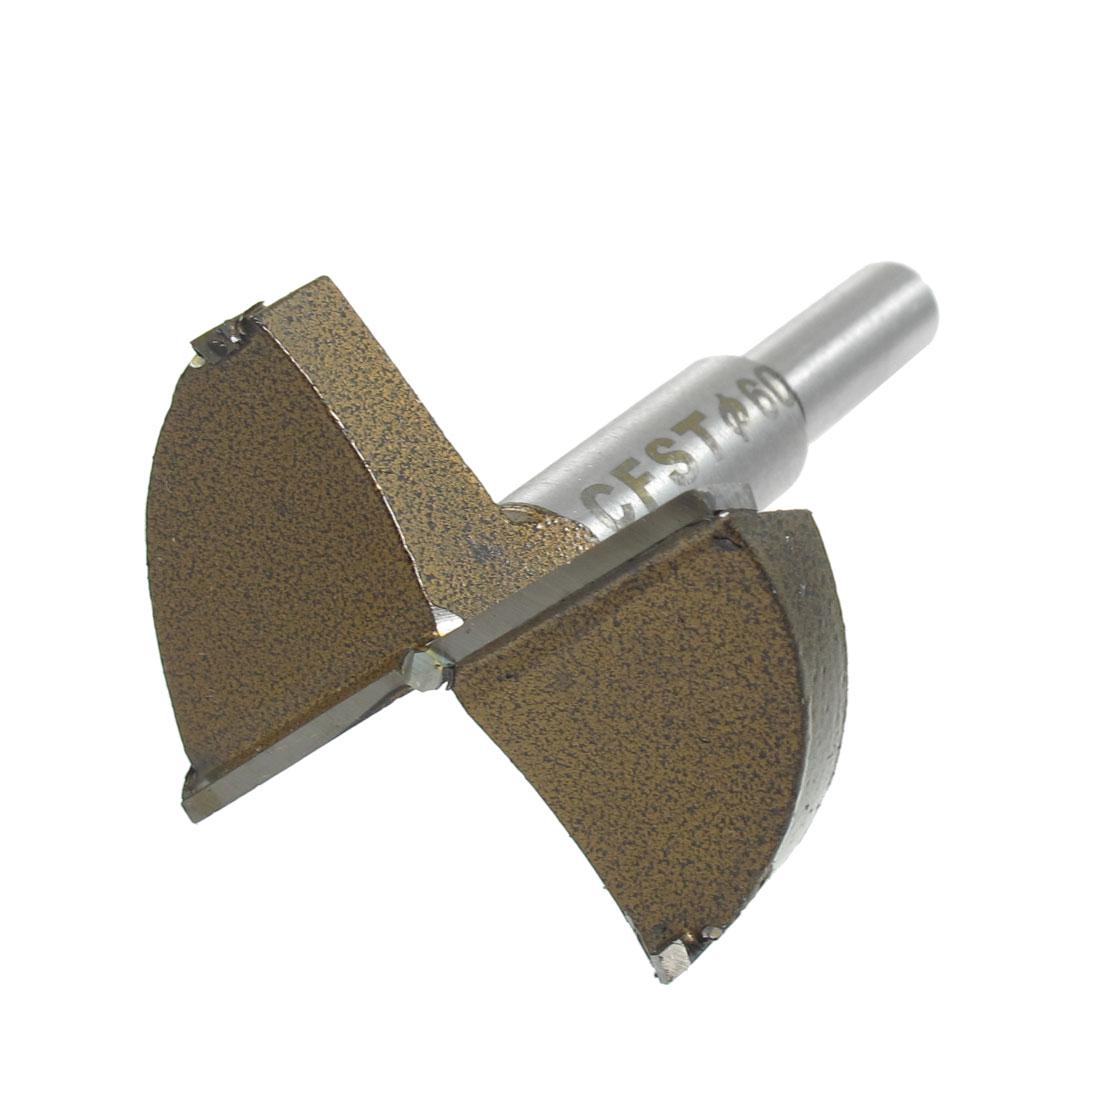 Silver Tone Shank 60mm Drilling Hinge Boring Bit Carpentry Tool